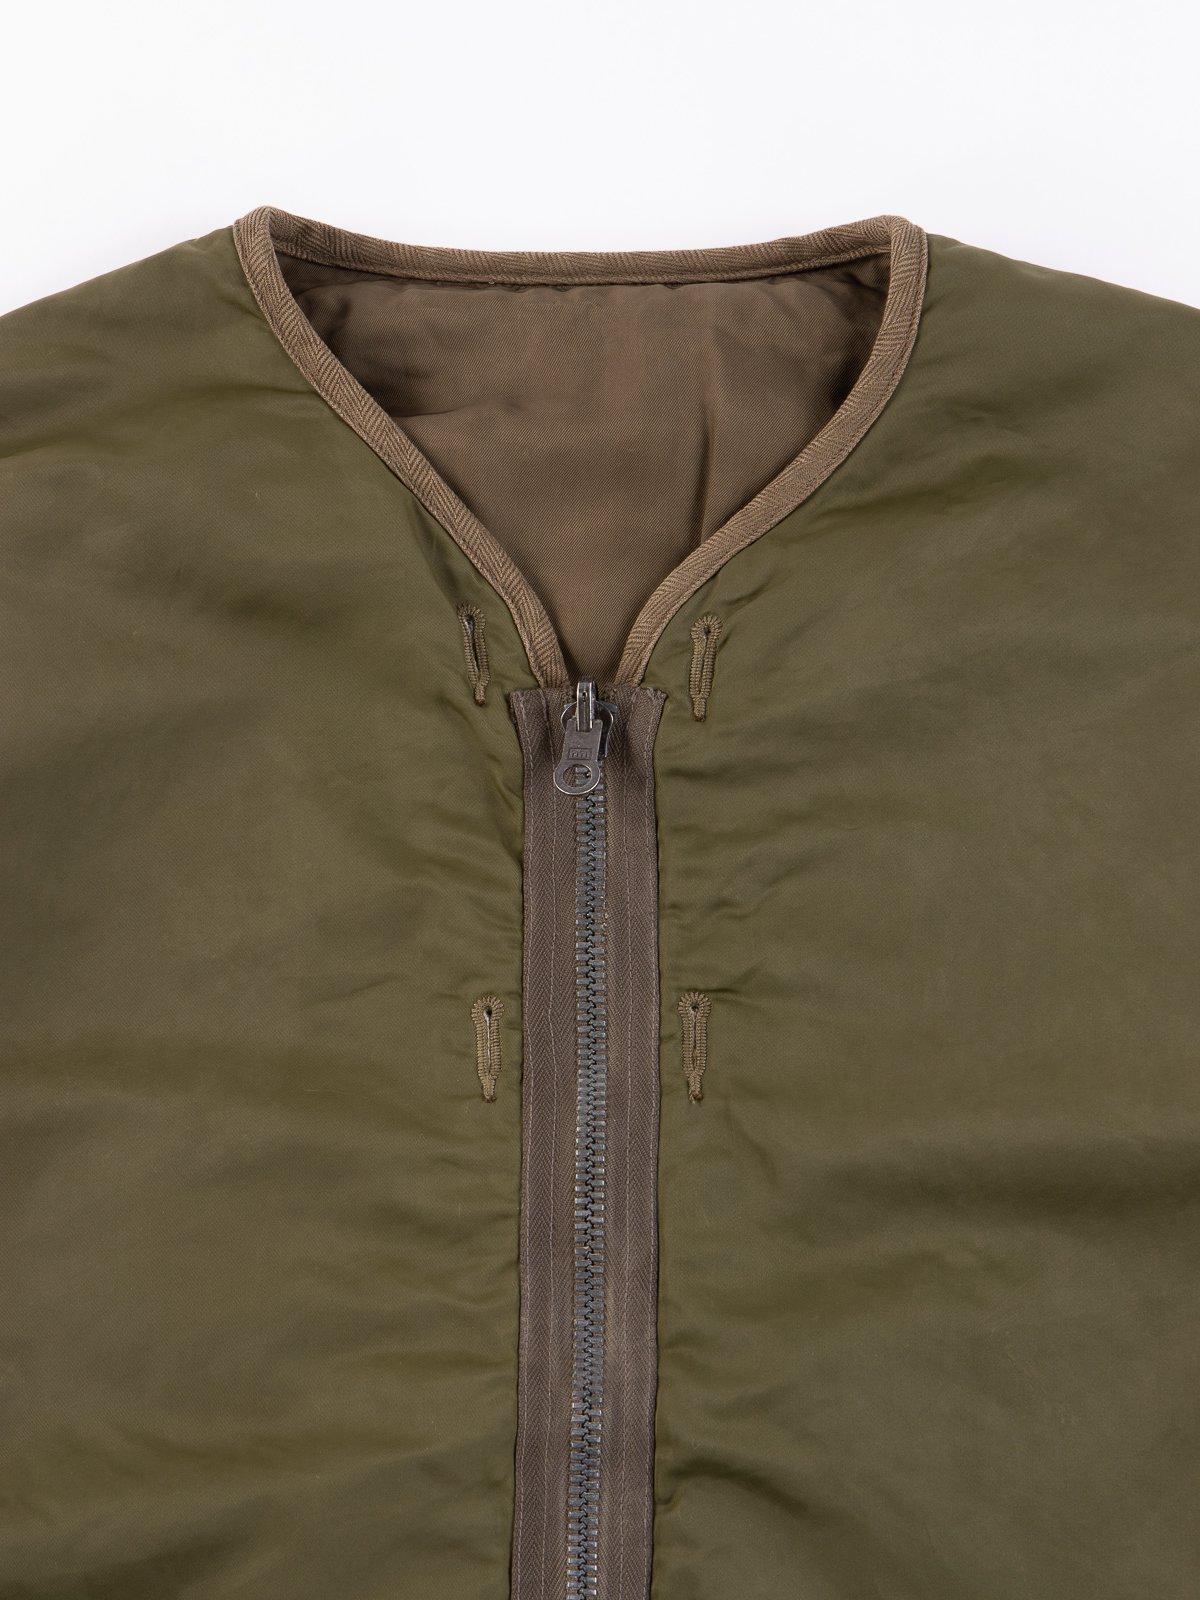 Olive Iris Liner Jacket - Image 2